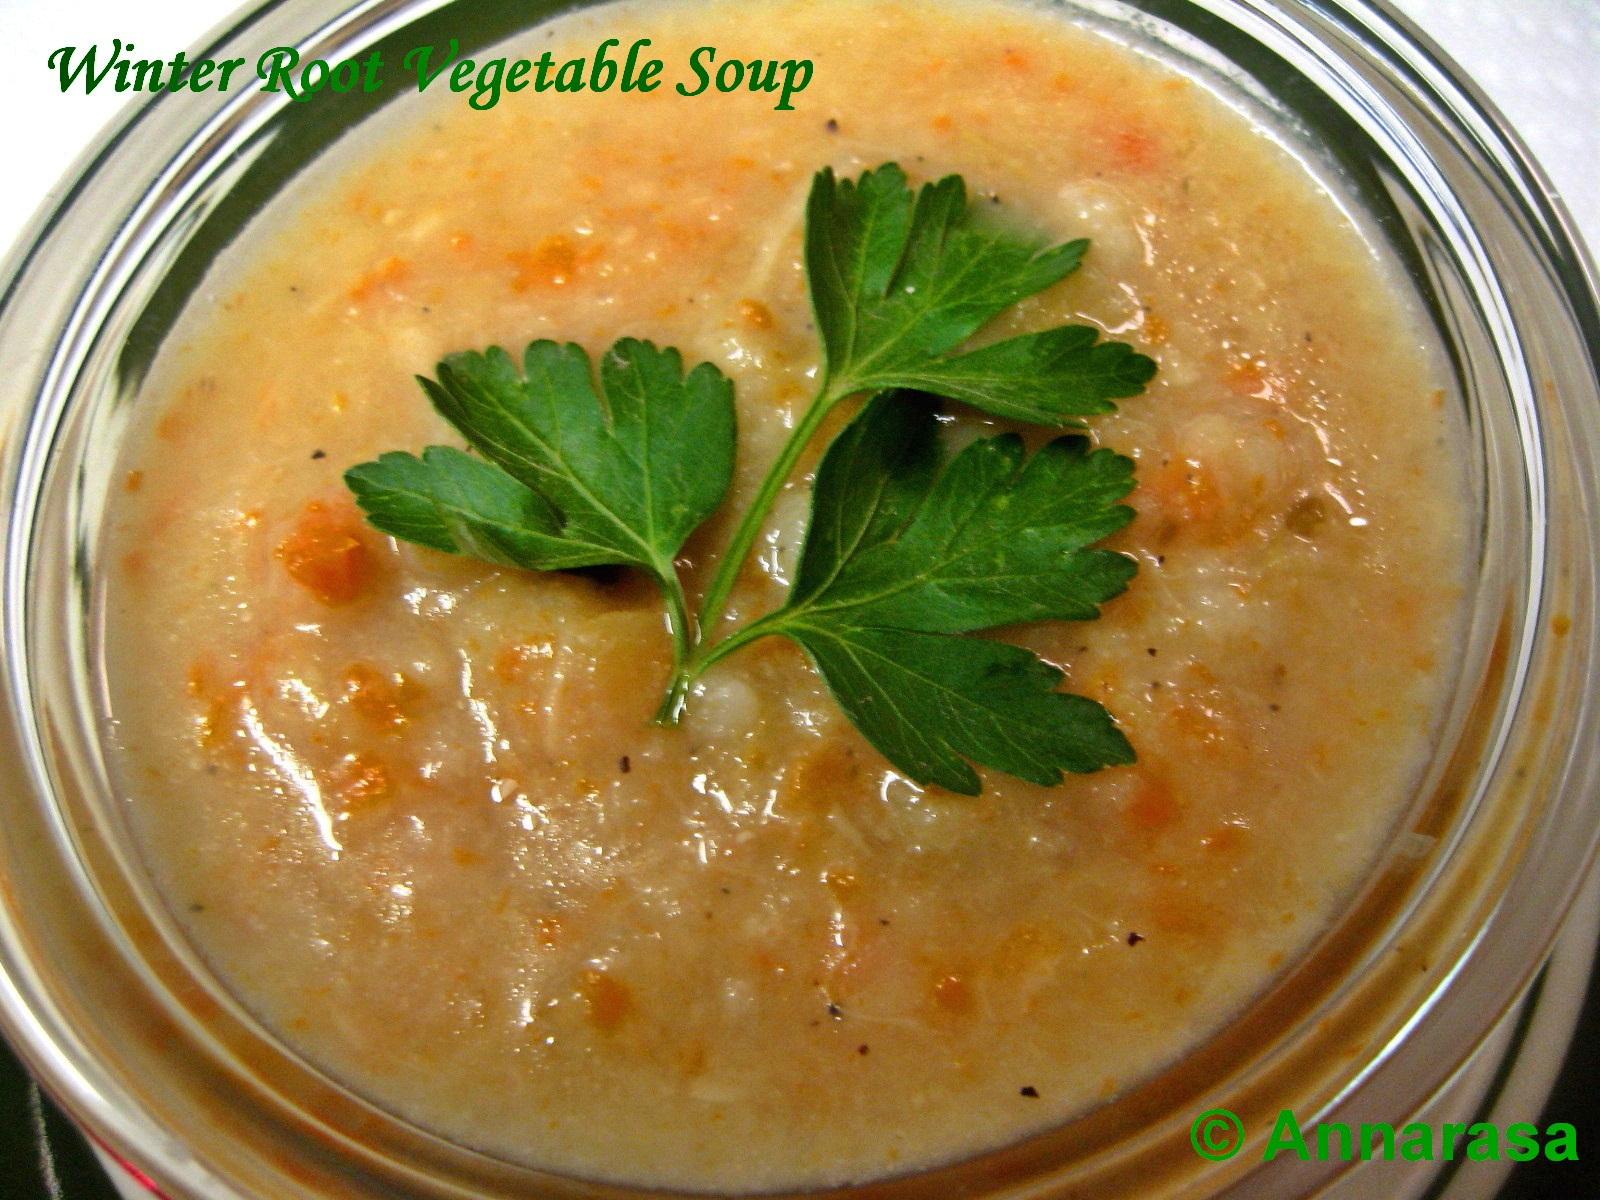 Annarasa ~ Essence of Food: Winter Root Vegetable Soup